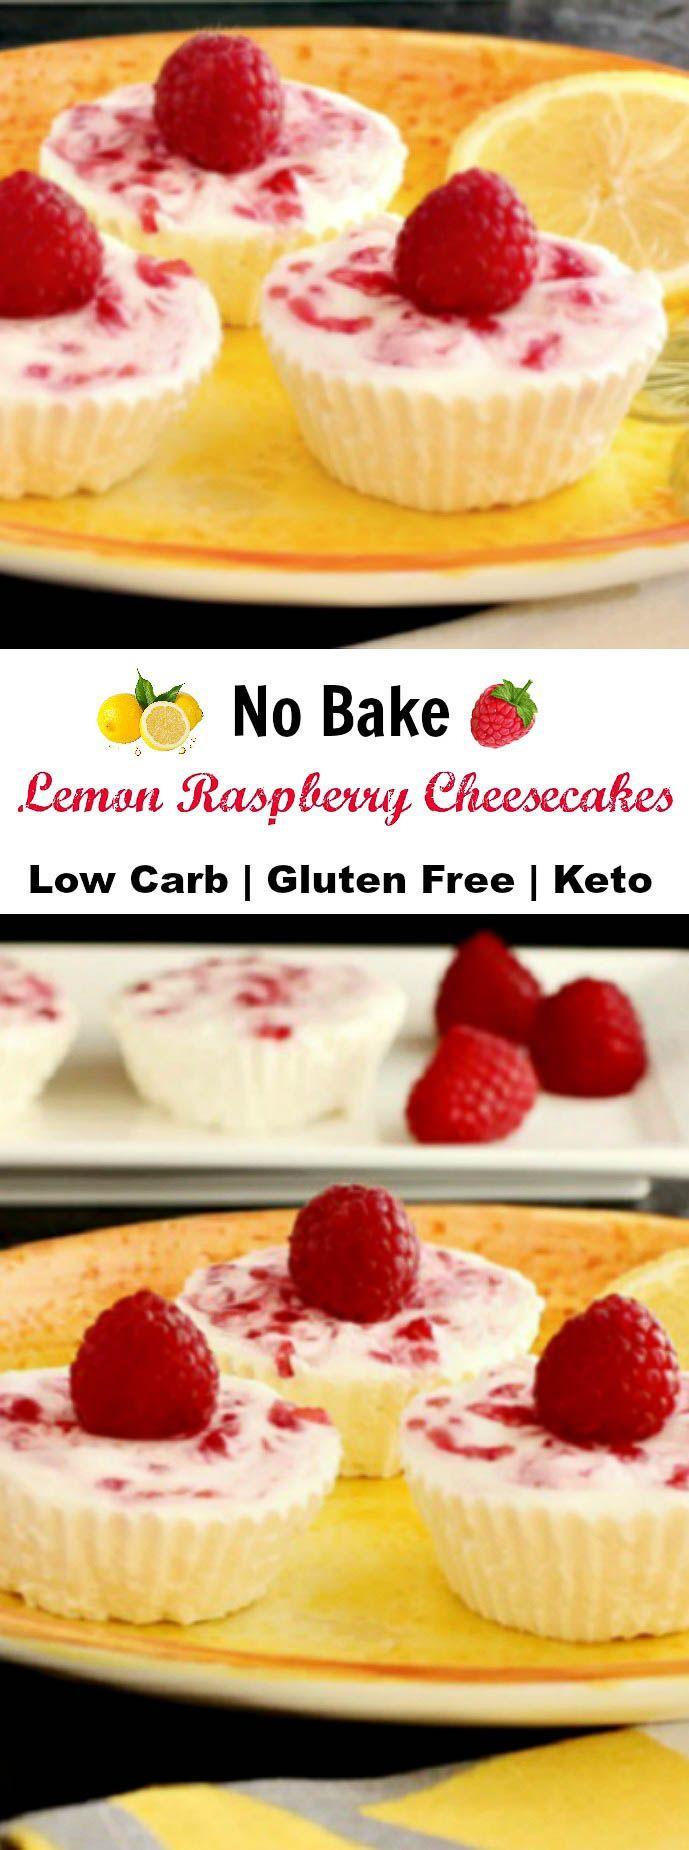 Lemon Raspberry no bake Cheesecake Bites, crust free, primal and low carb